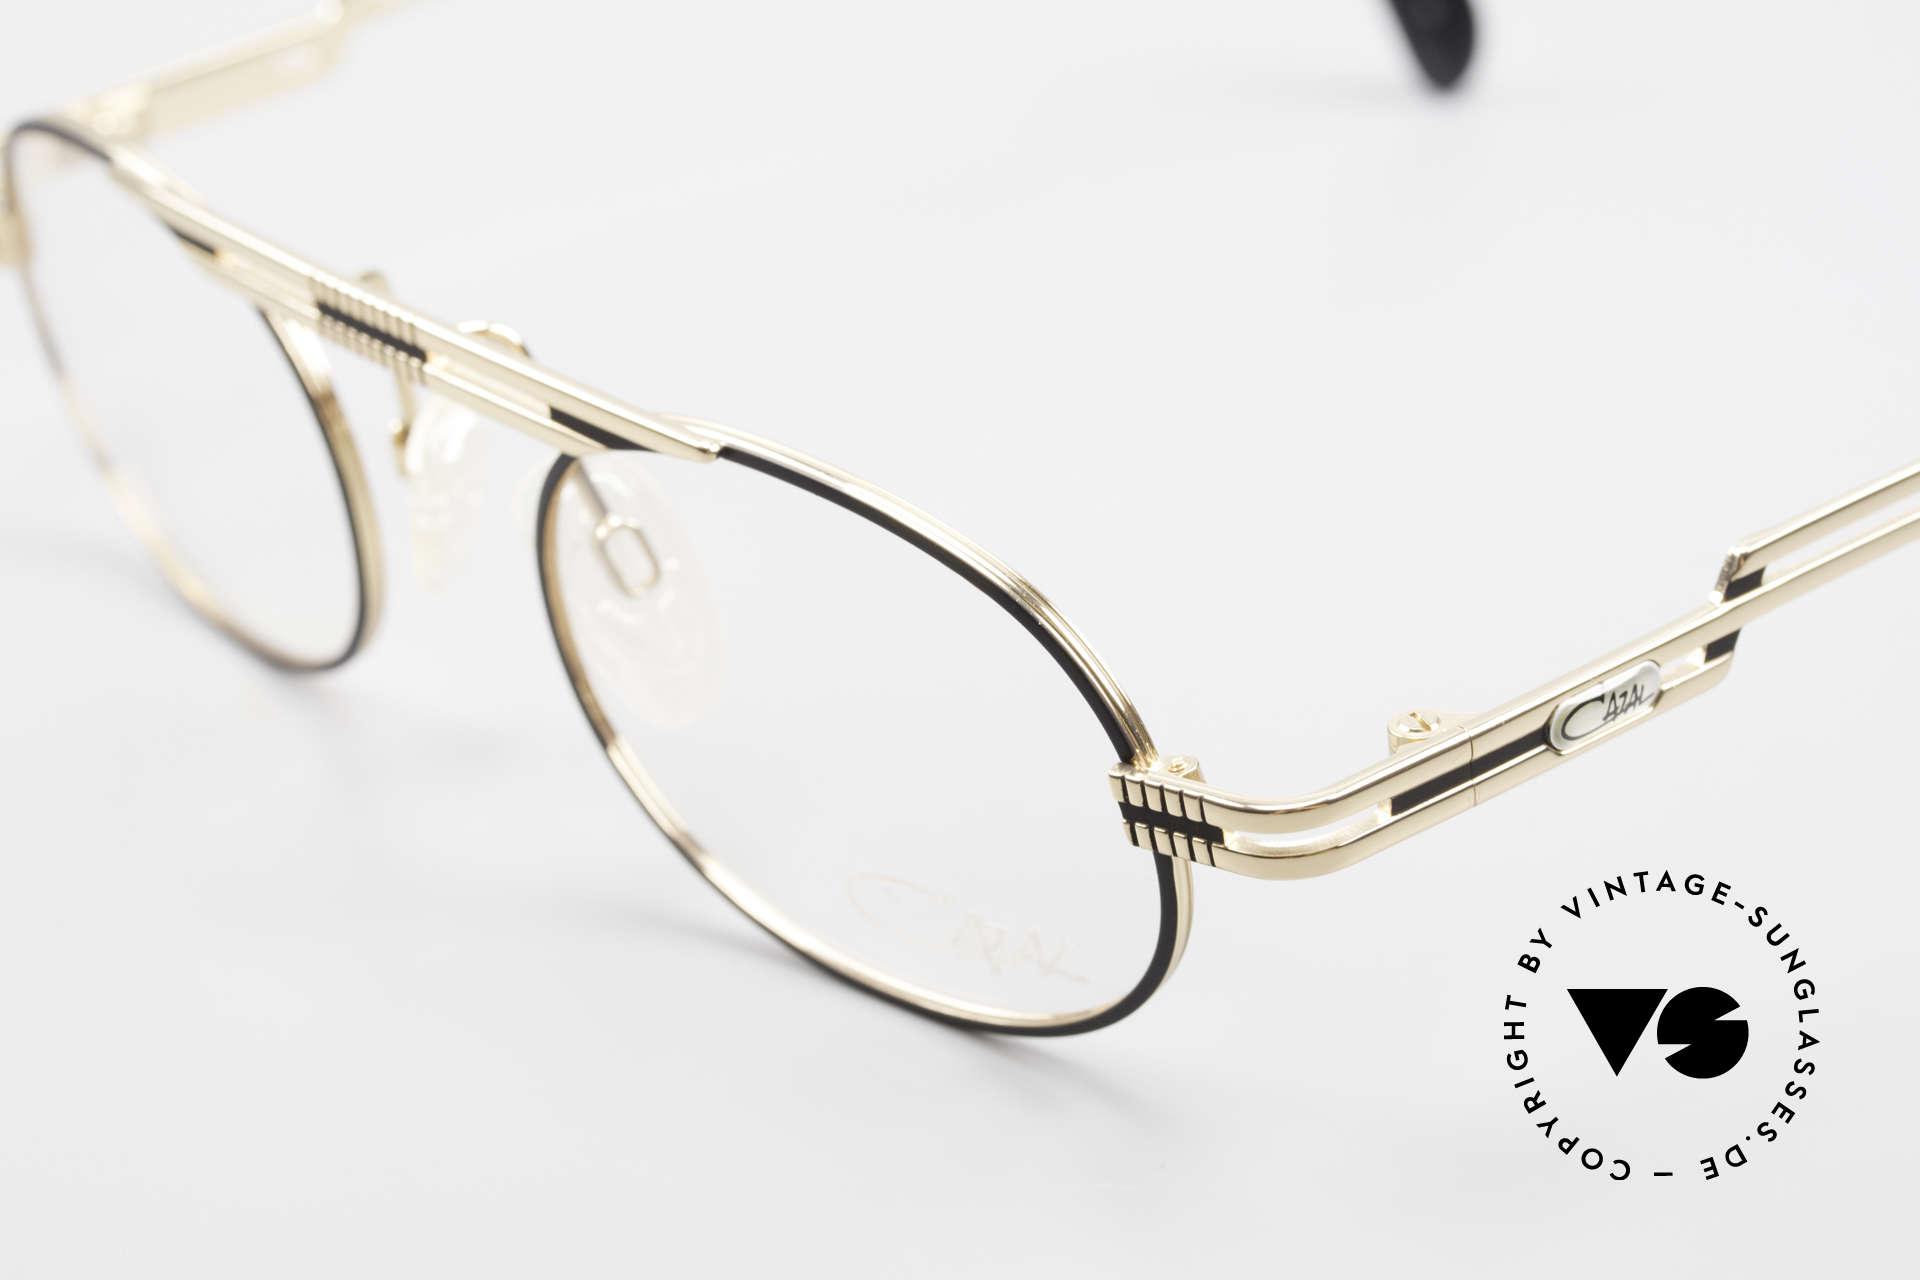 Cazal 762 Oval 90's Vintage Eyeglasses, unworn (like all our rare vintage Cazal eyeglasses), Made for Men and Women